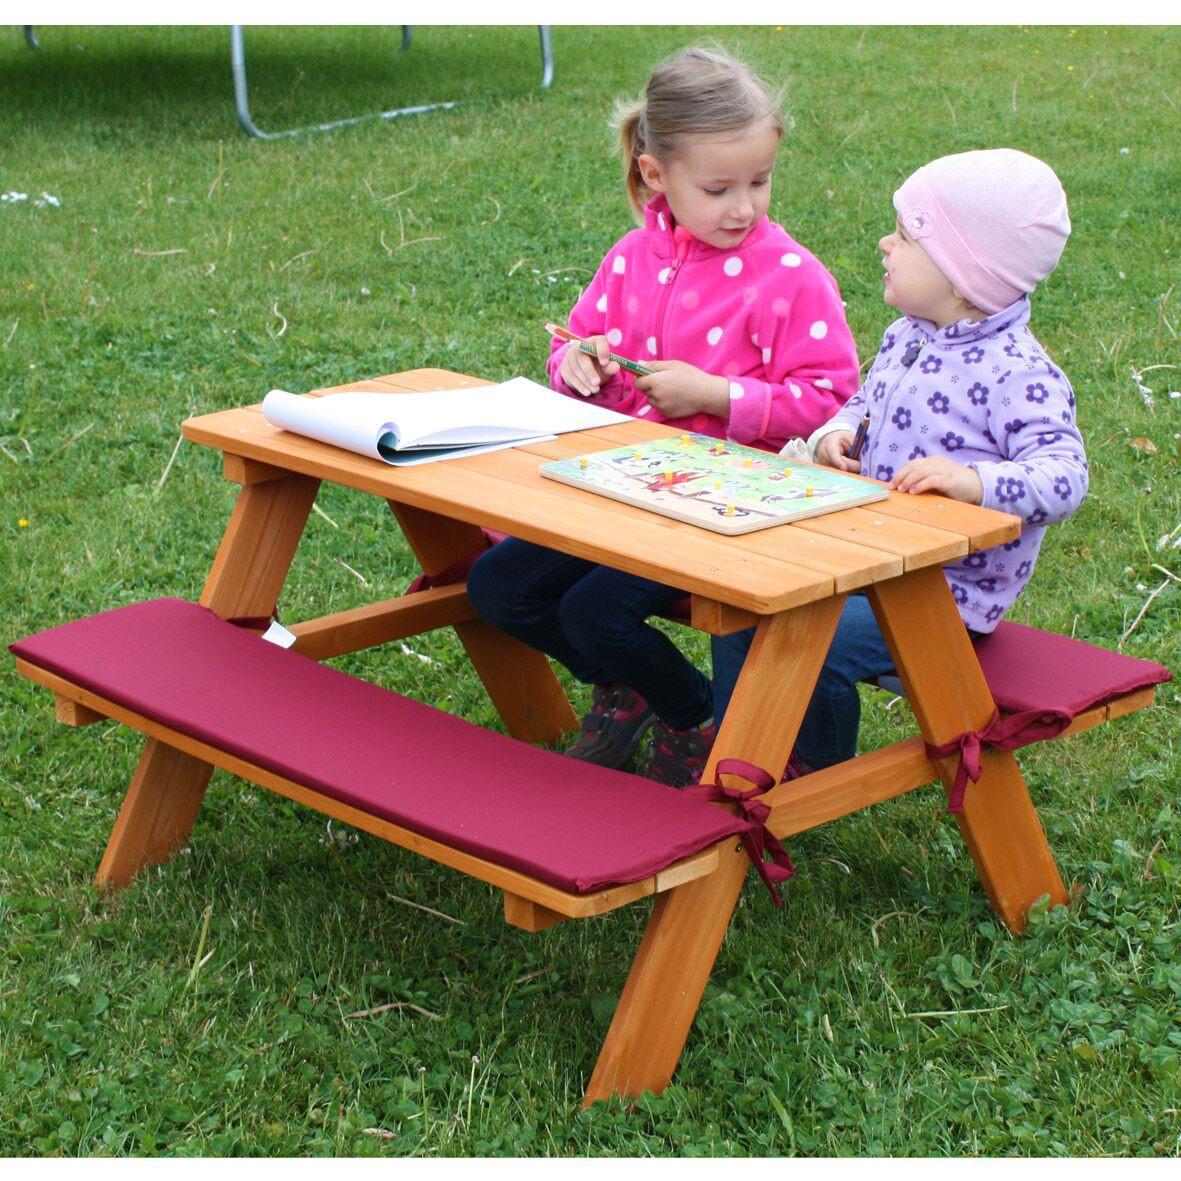 kinder sitzgruppe picknickbank habau mit polsterauflage 89x79x50cm bei. Black Bedroom Furniture Sets. Home Design Ideas